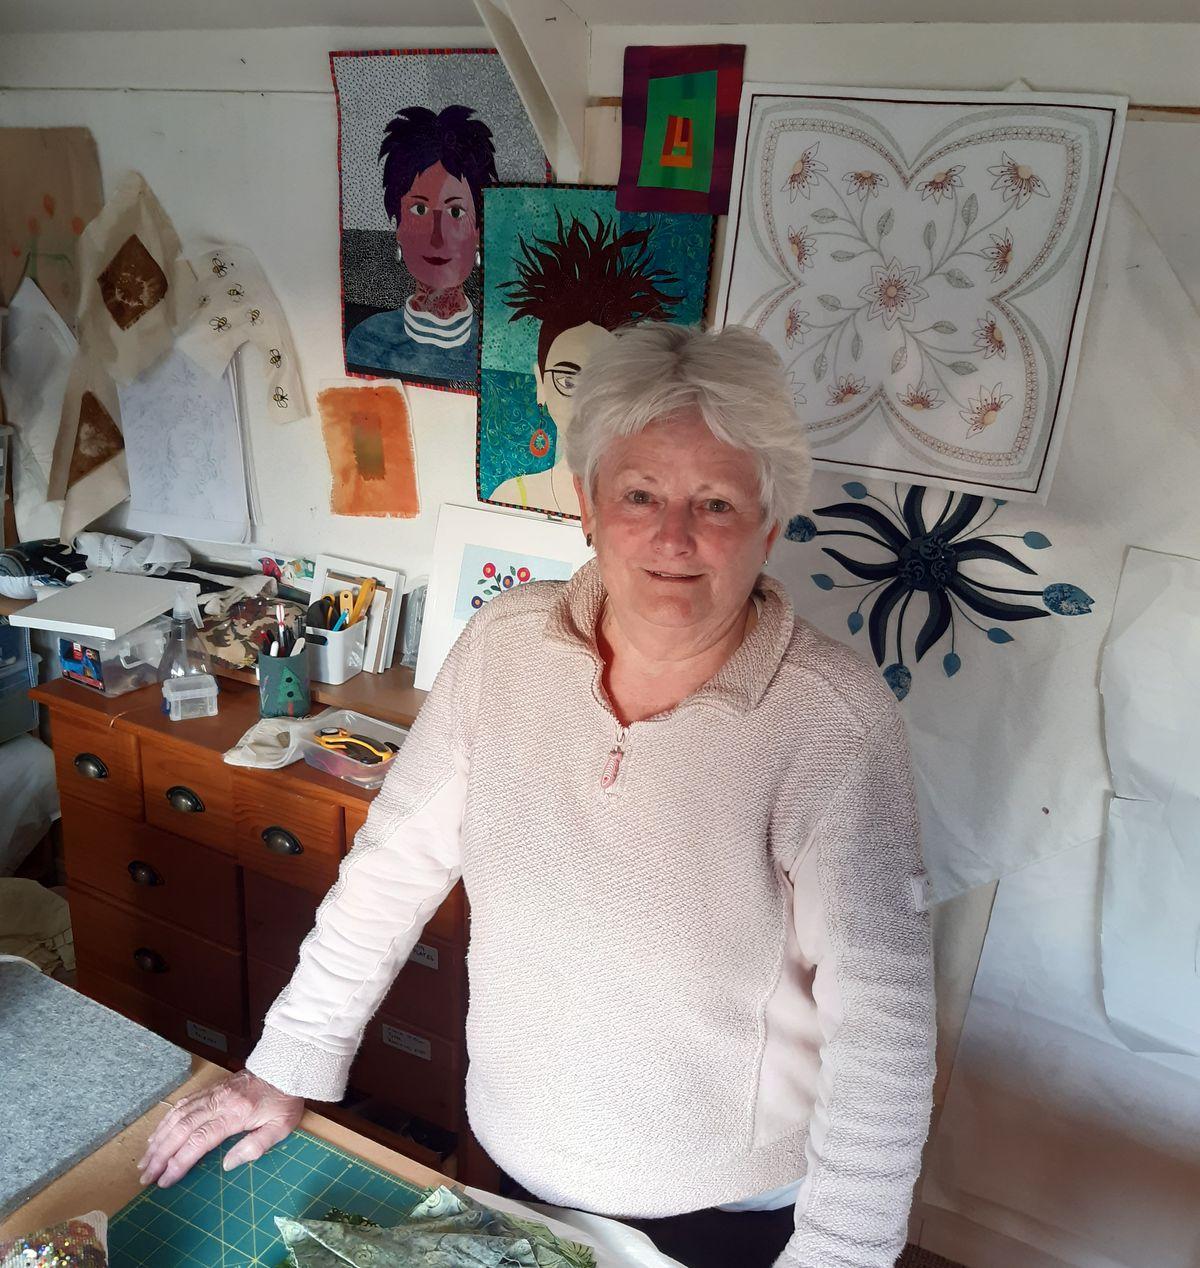 Textile artist Lesley Smith in her workshop